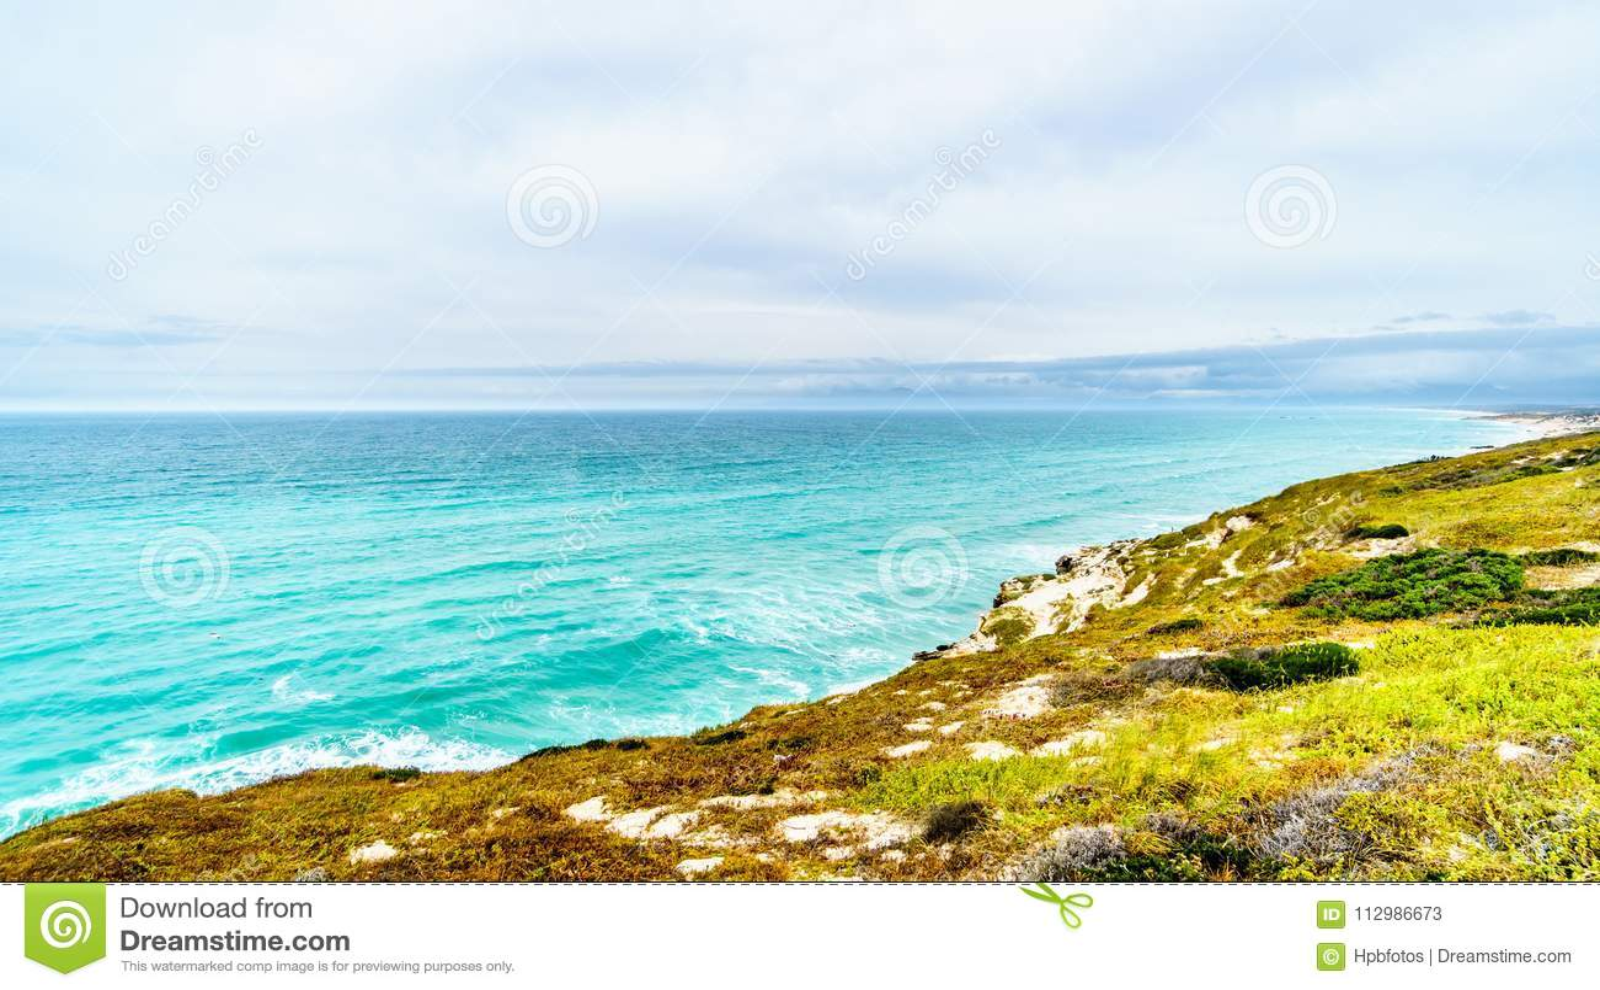 The beautiful Coastline of False Bay along Baden Powell Drive between Macassar and Muizenberg near Cape Town